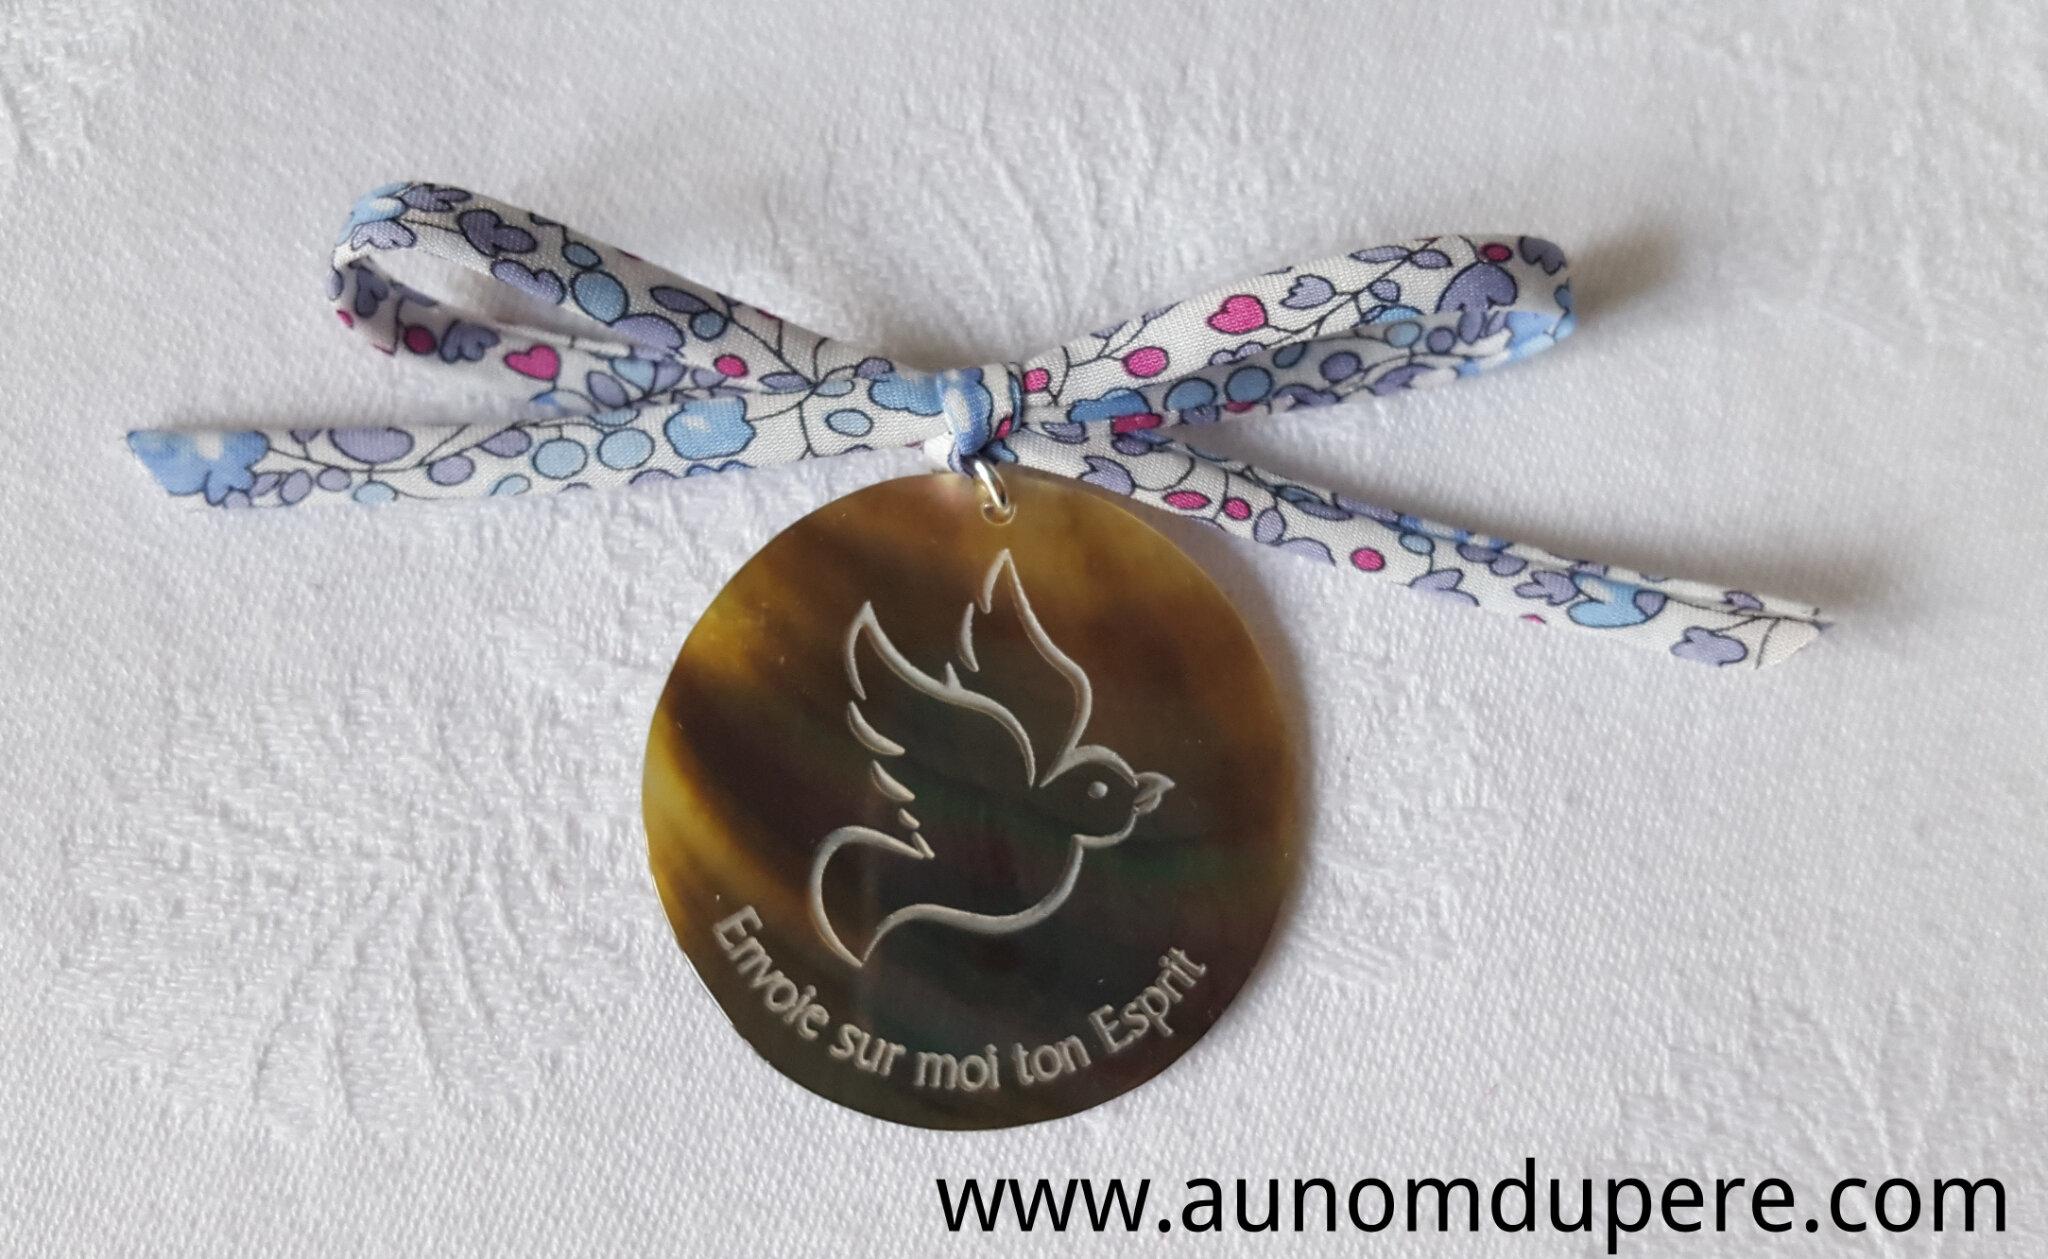 Médaillon colombe en nacre sur cordon Liberty (Eloïse bleu) - 22 €